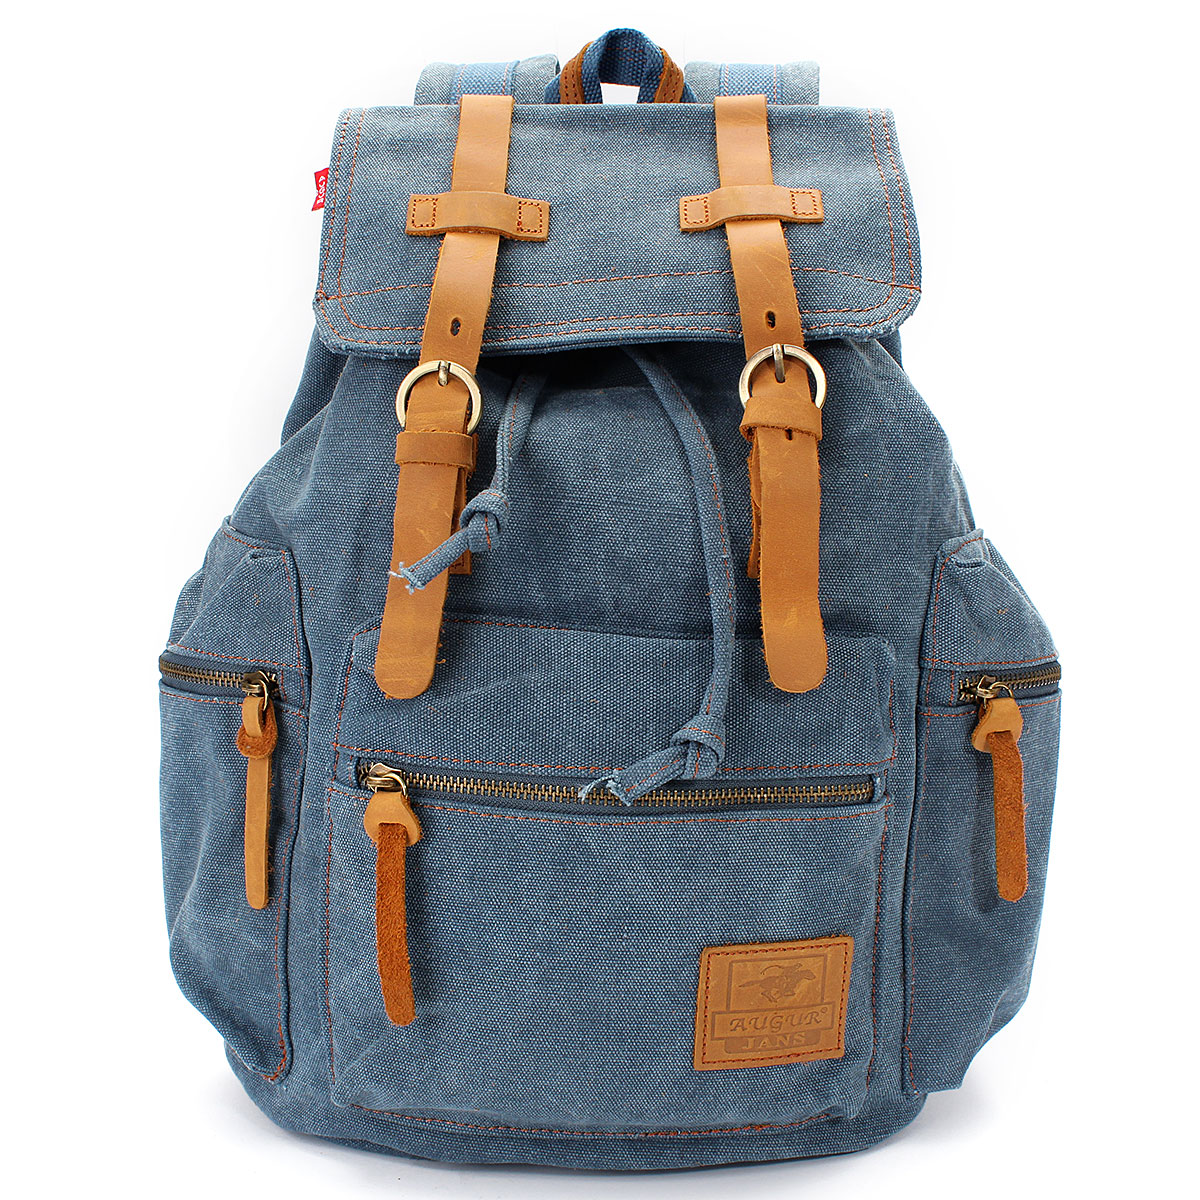 Retro Men Women Travel Canvas Backpack Rucksack Satchel Hiking Sport School Bag by